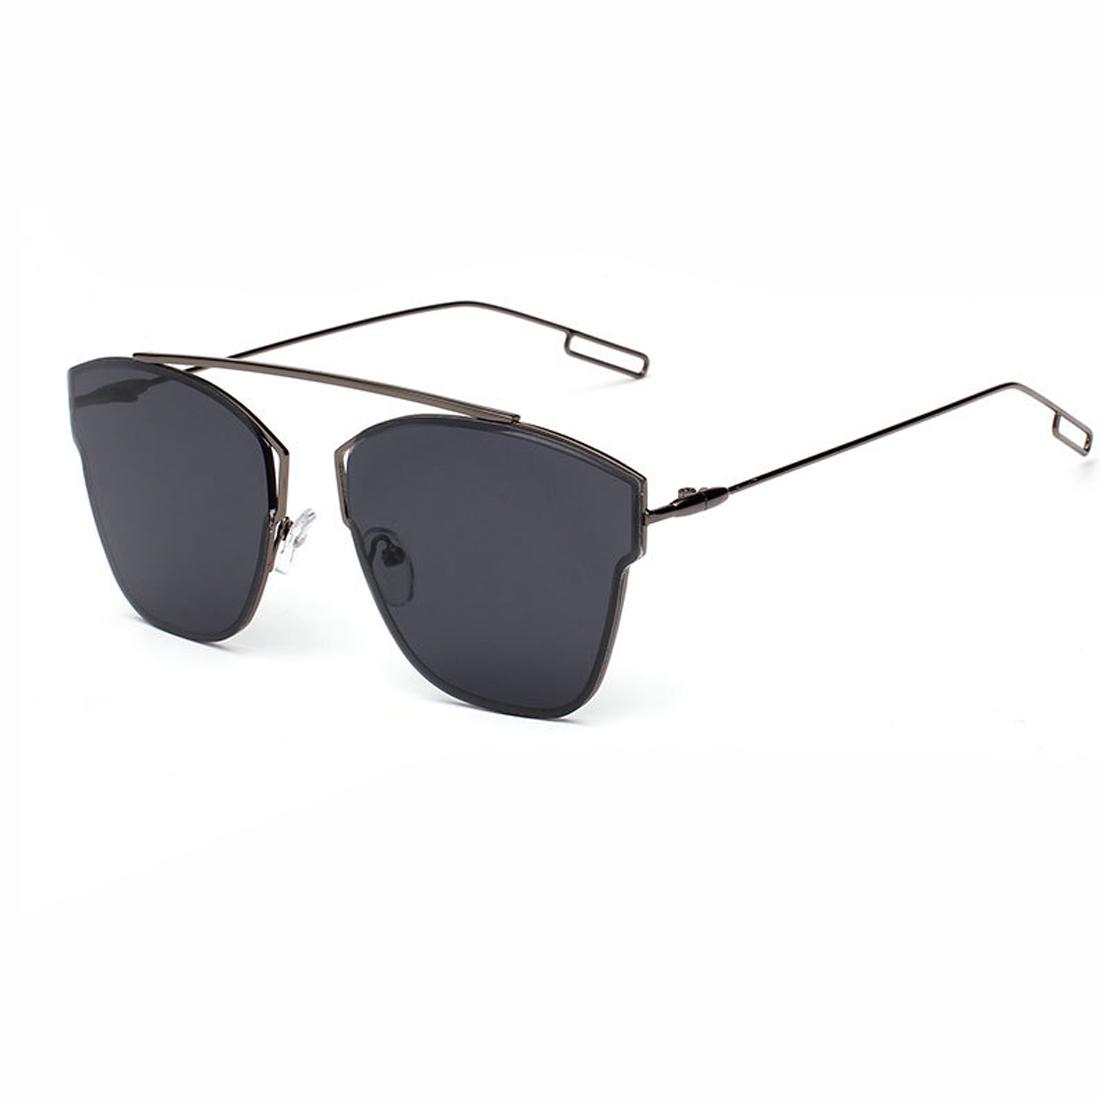 Солнцезащитные очки XQ-HD Серое серое серое серое фото